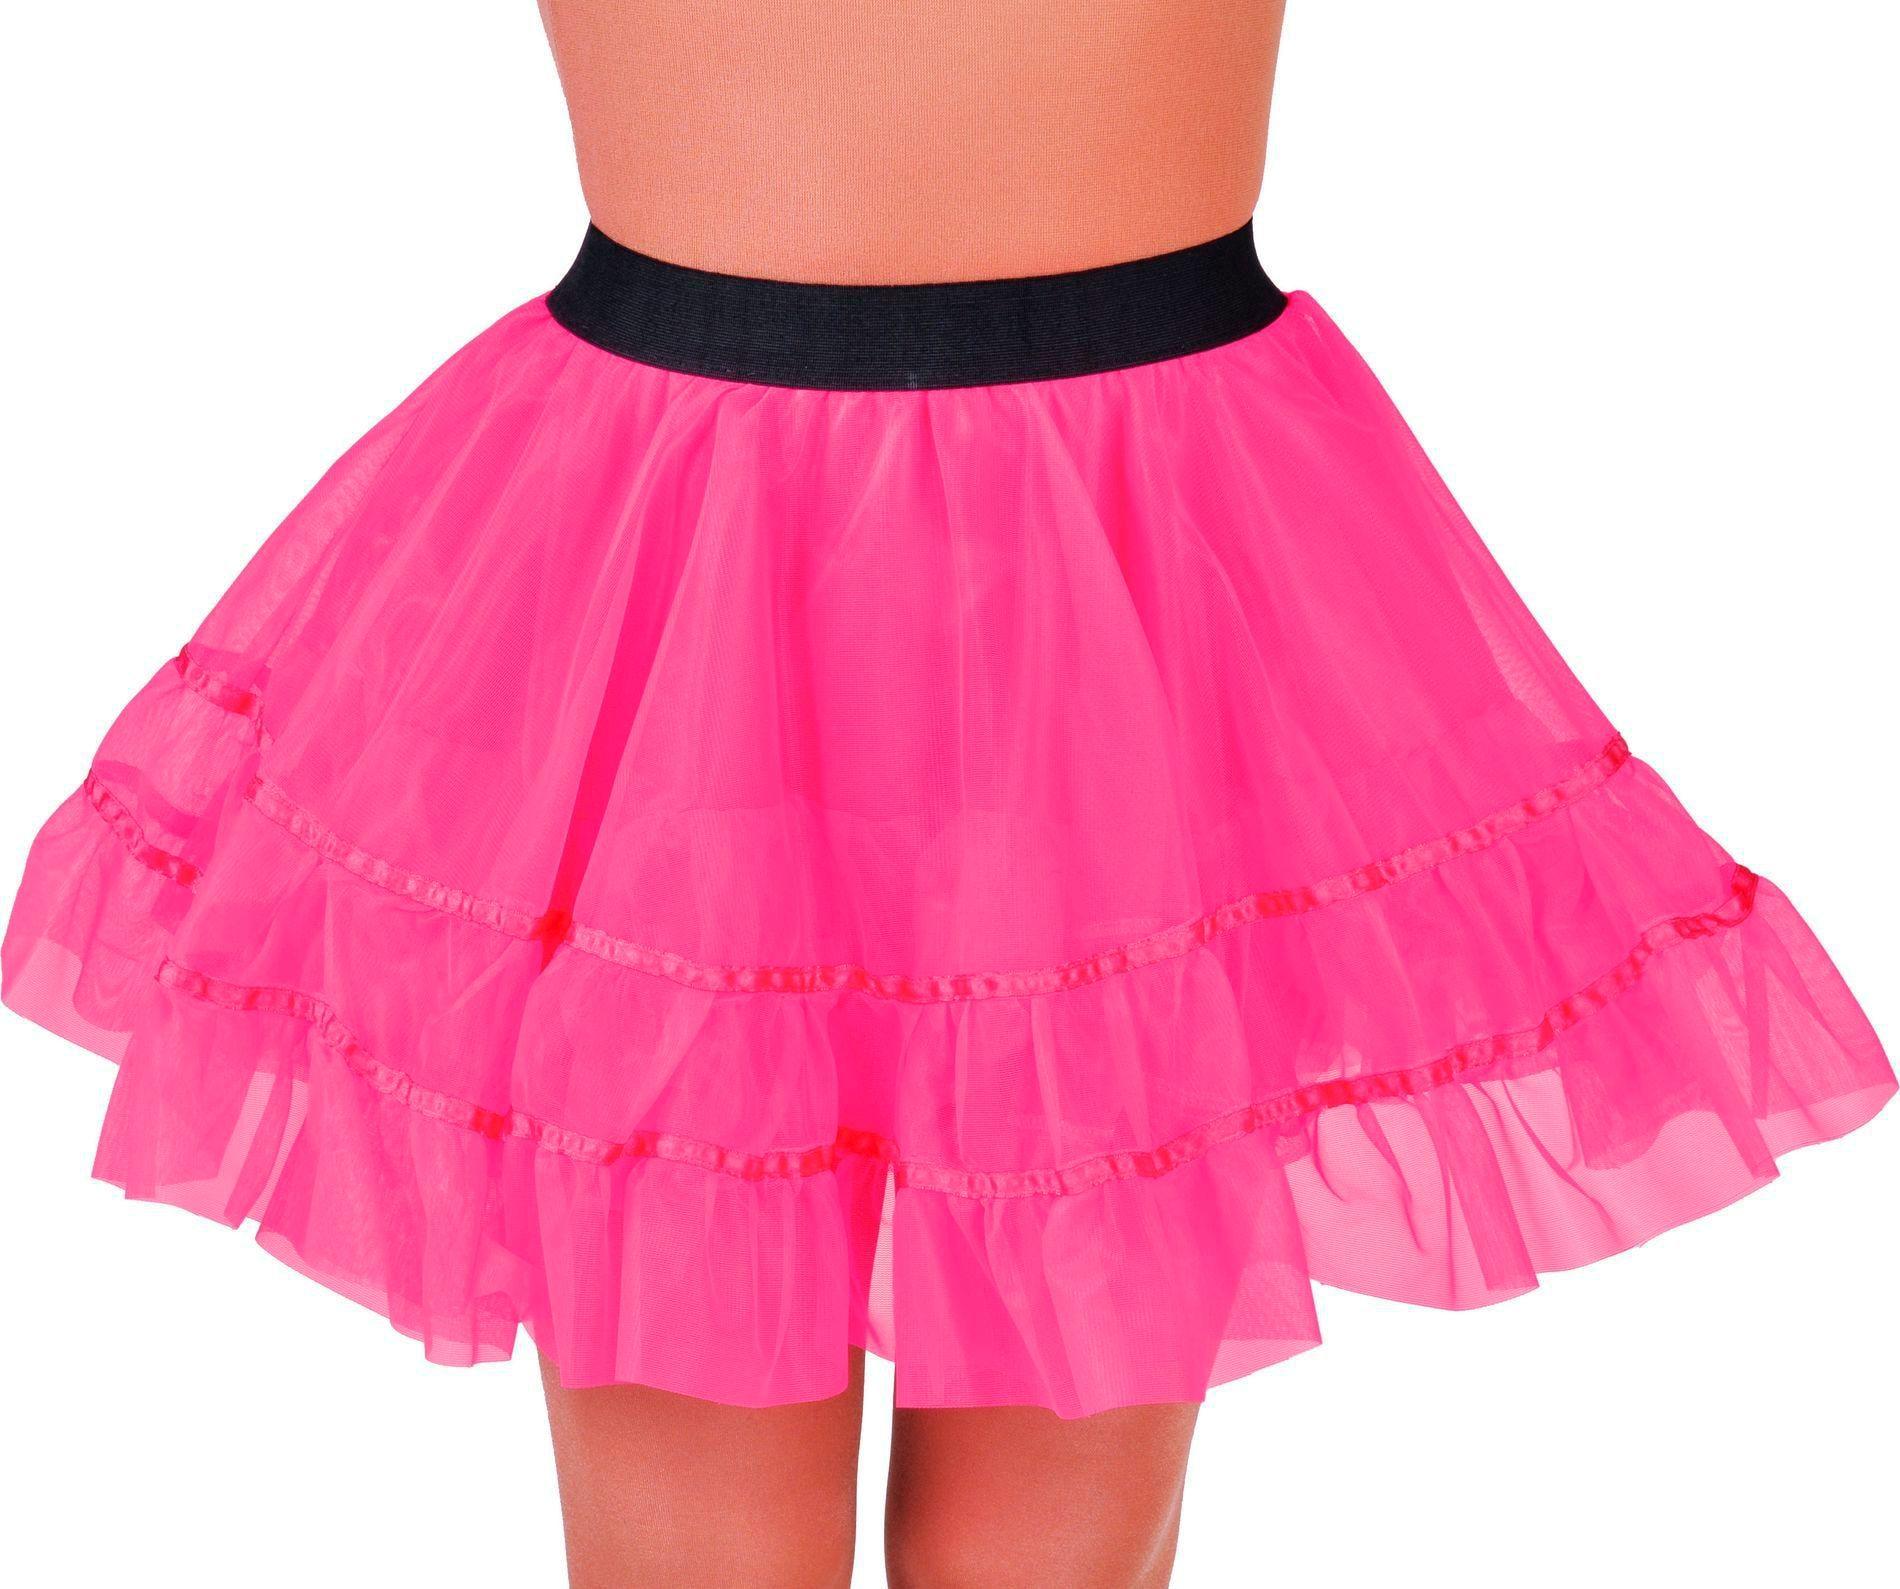 Roze petticoat rok